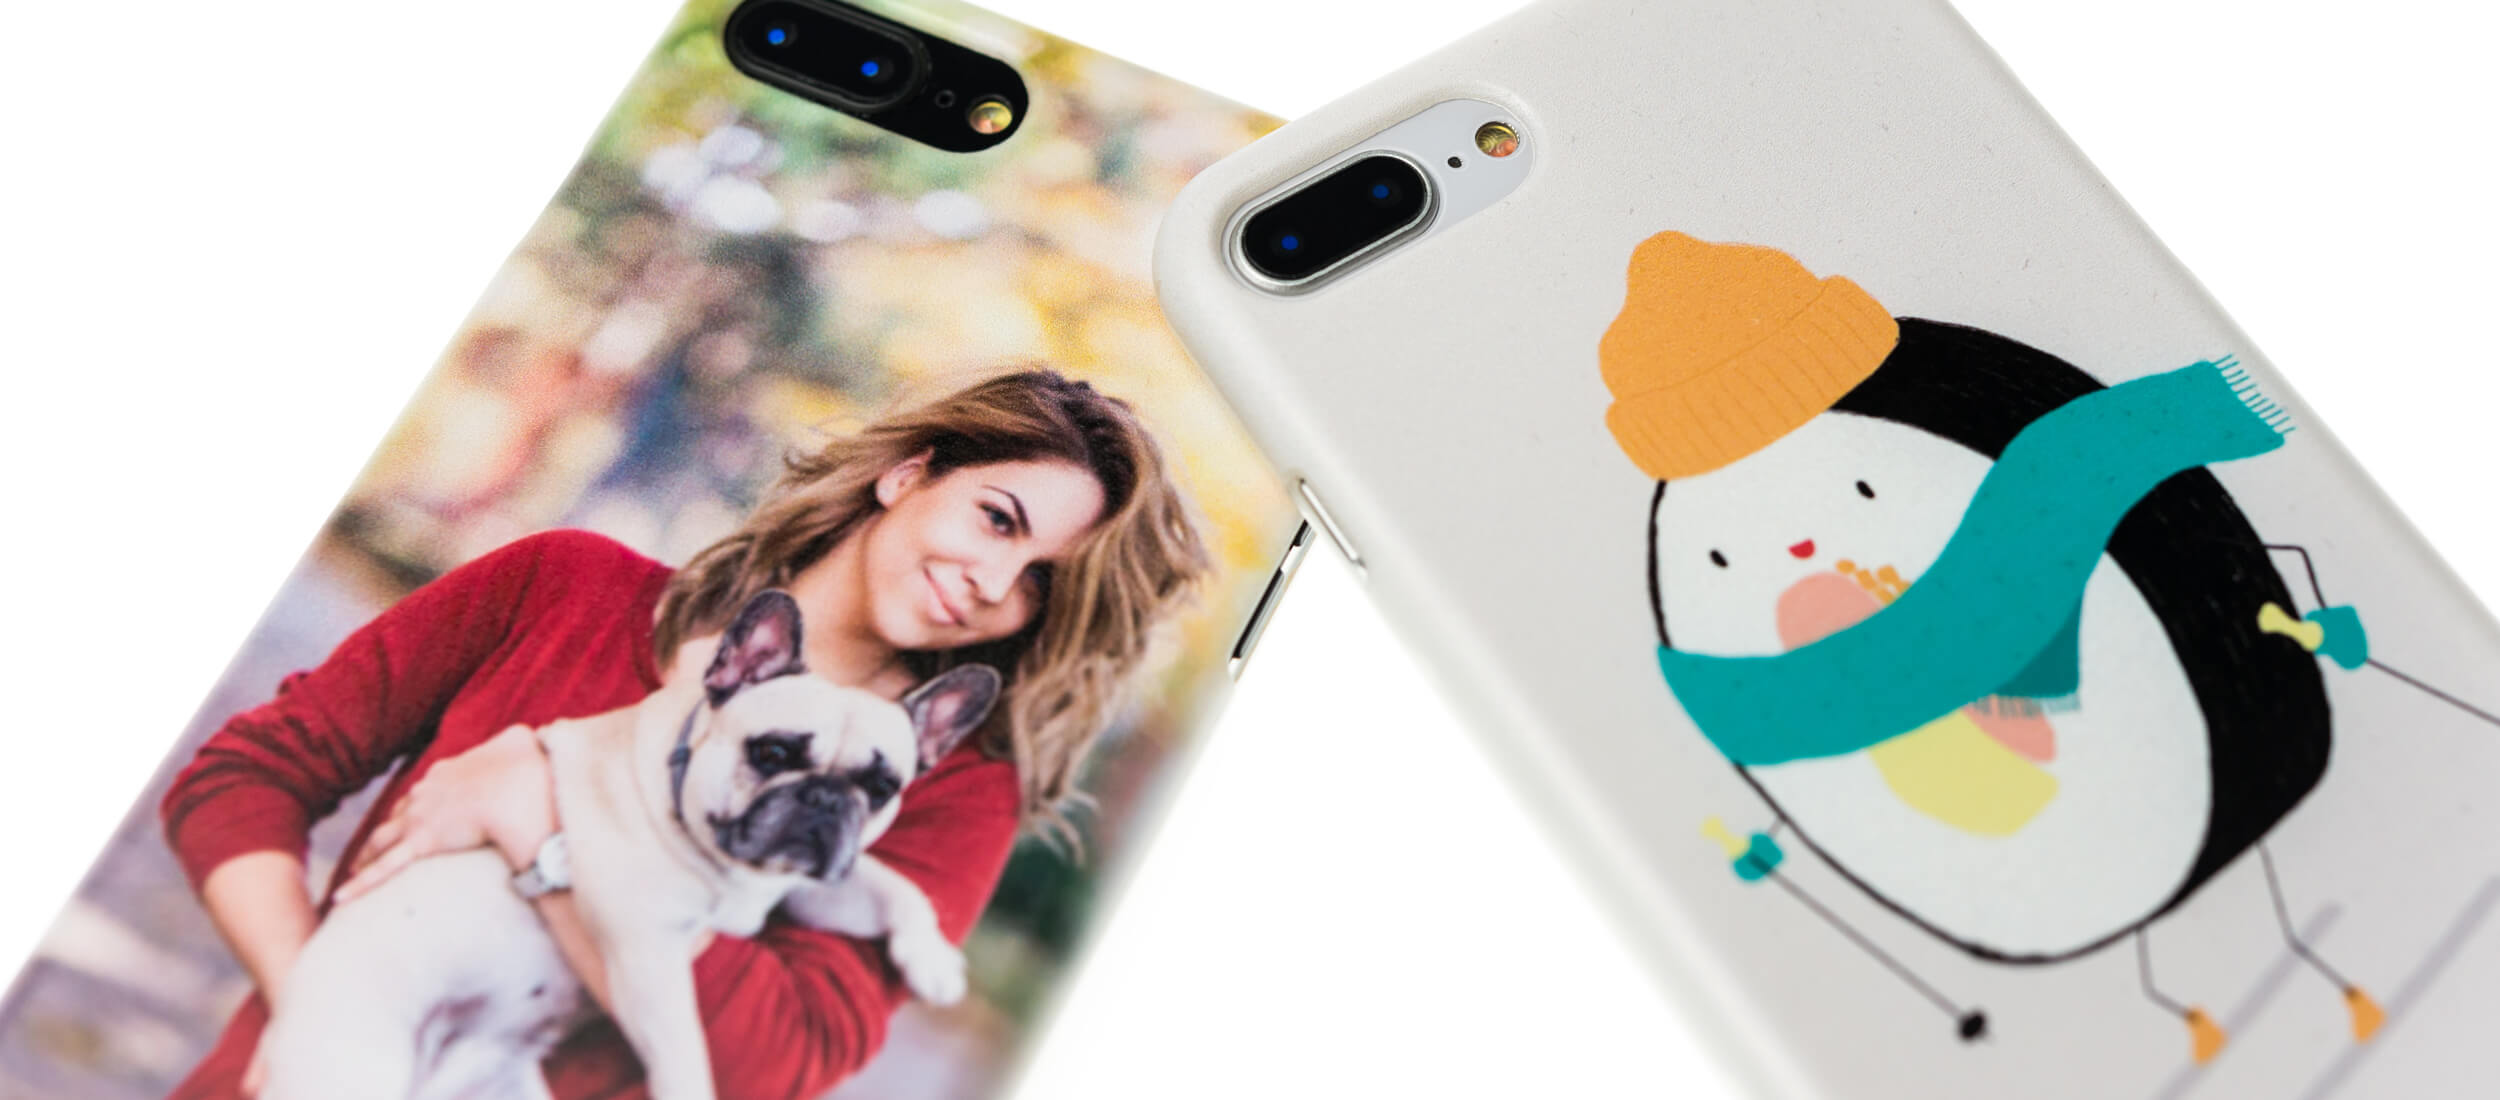 cover-iphone-8-plus-personalizzate_02